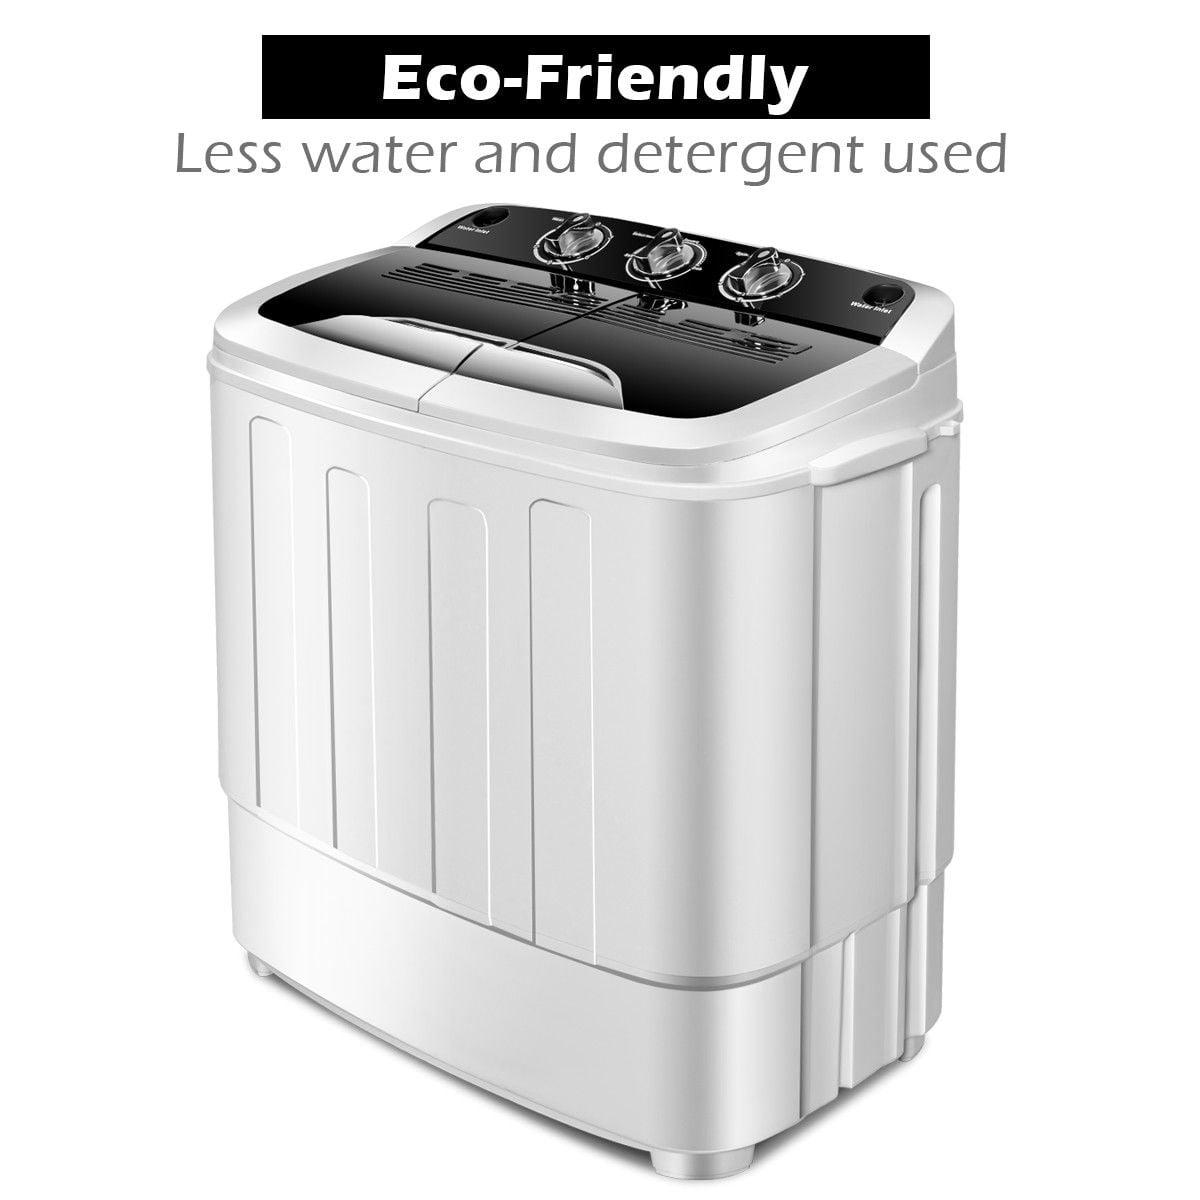 Twin Tub Washing Machine Caravan 6.5kg Compact Top Loader Portable Spin Dryer